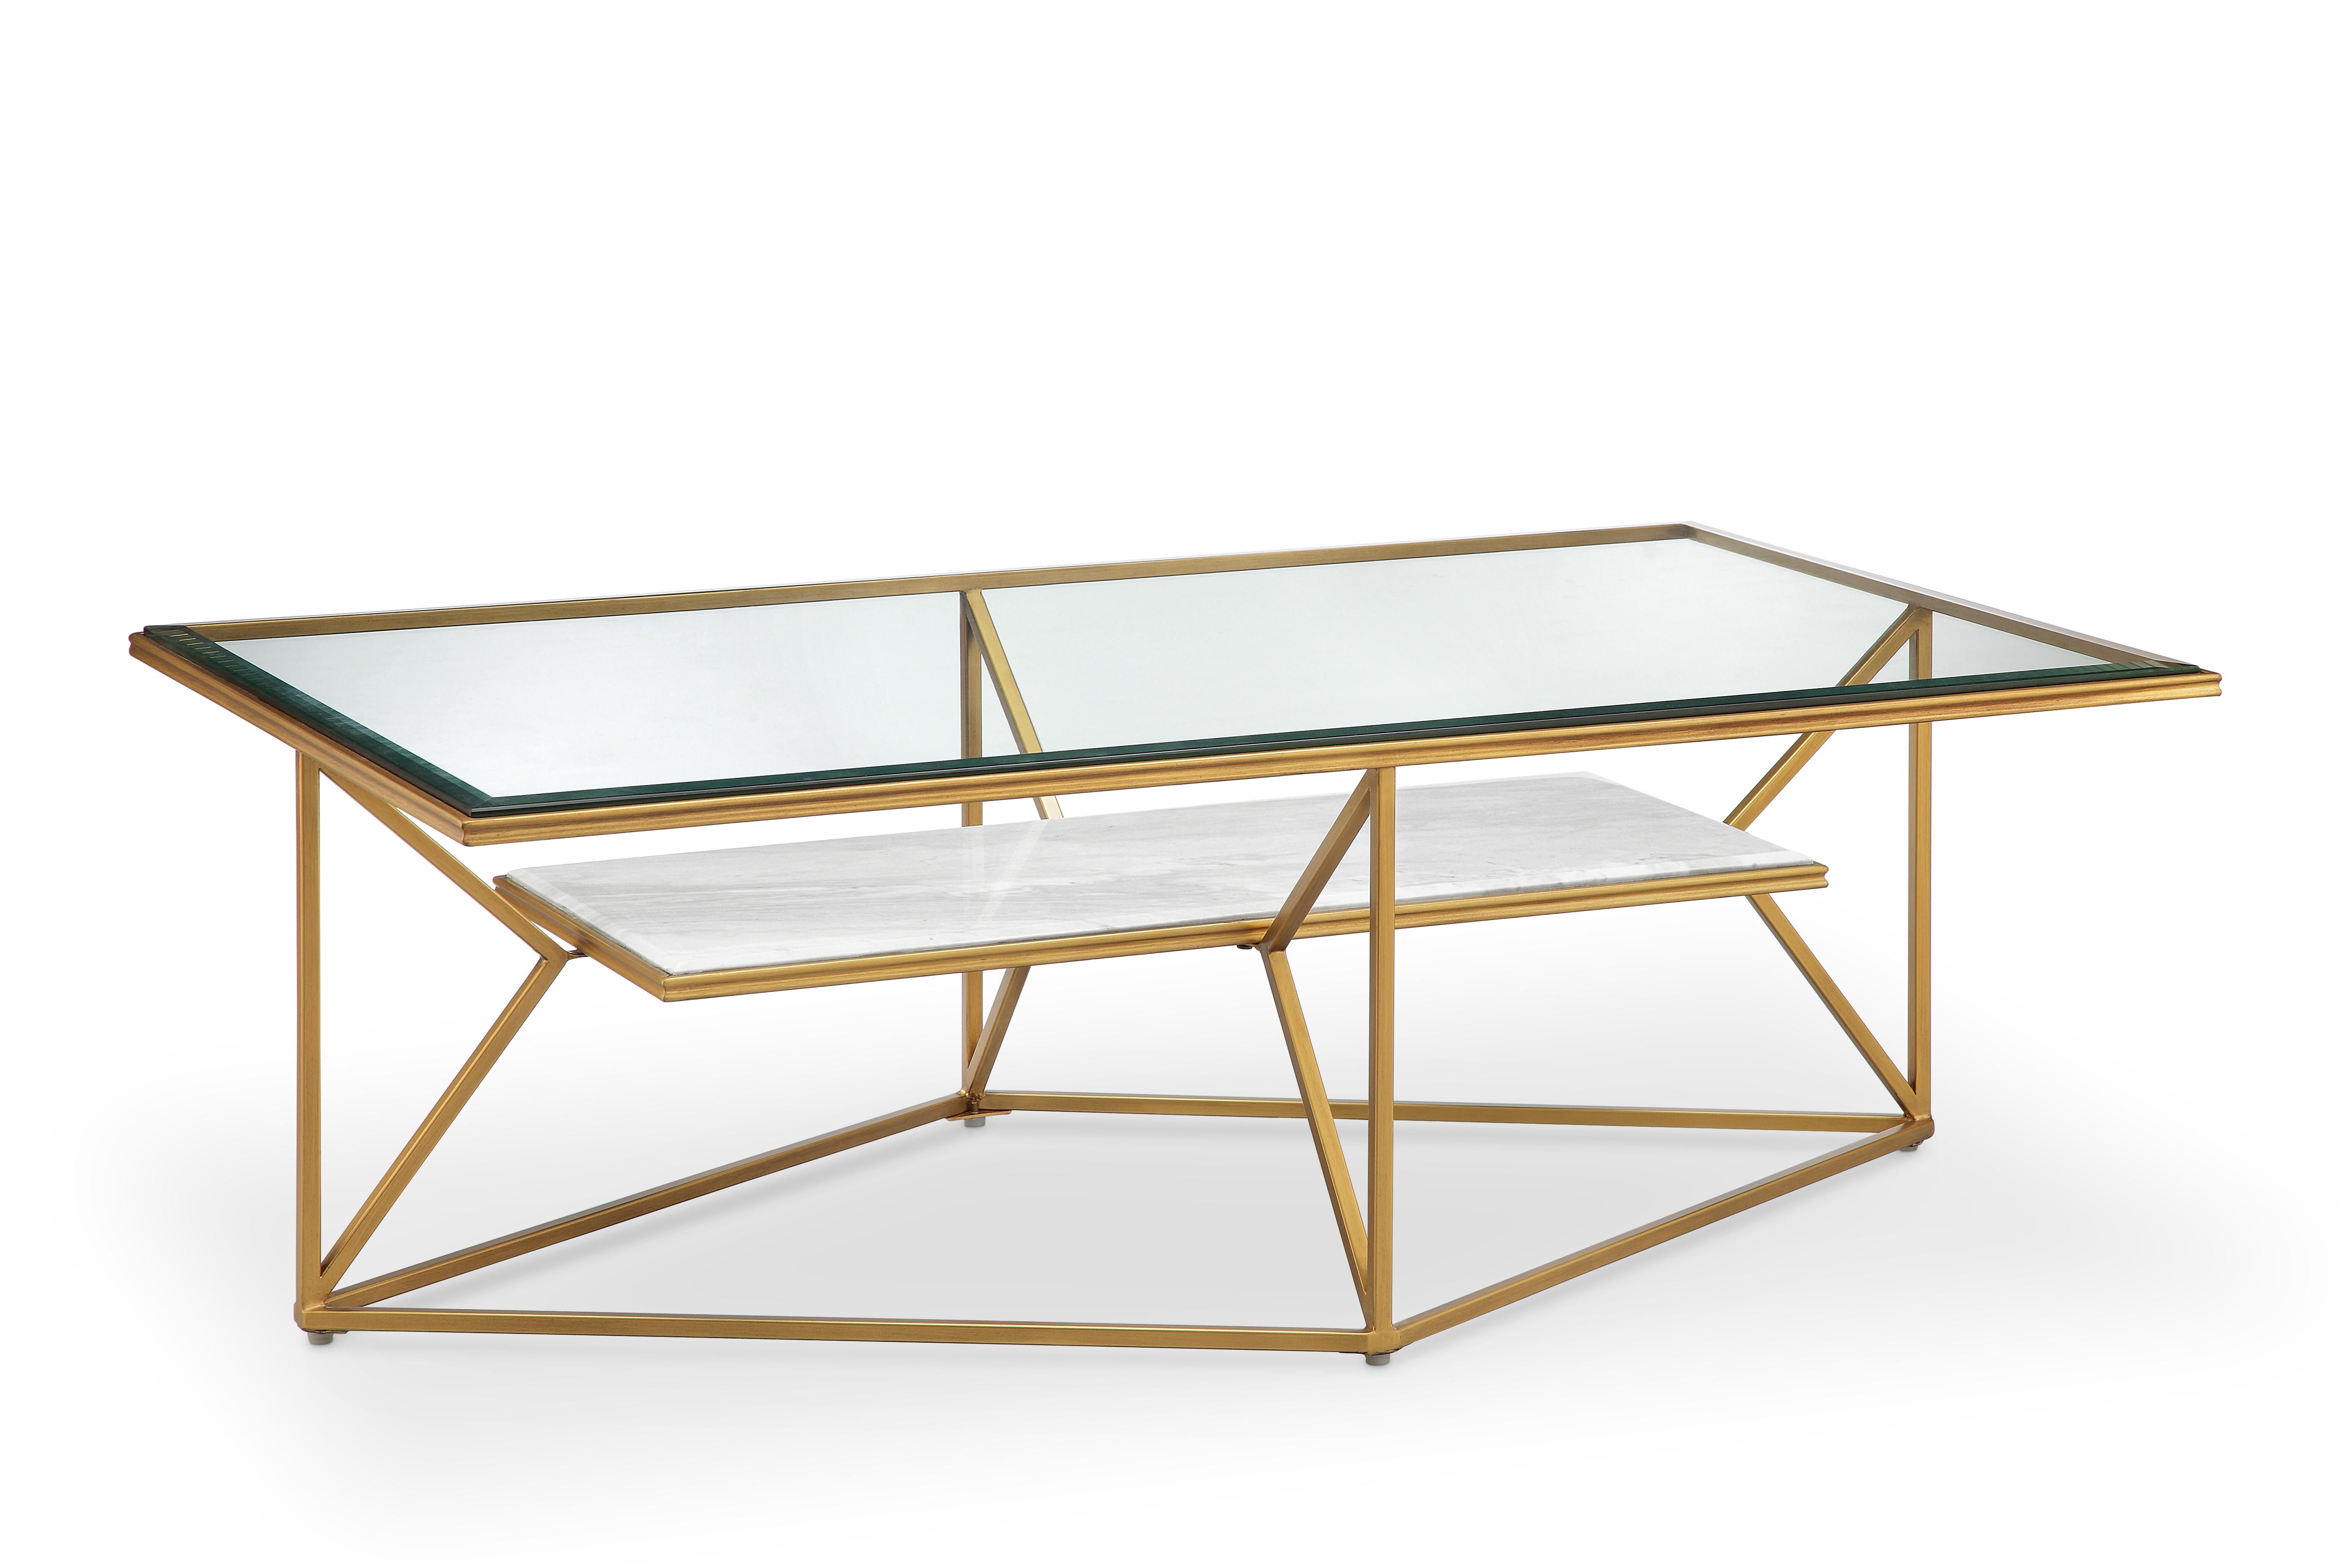 couchtische sch ffer american home. Black Bedroom Furniture Sets. Home Design Ideas